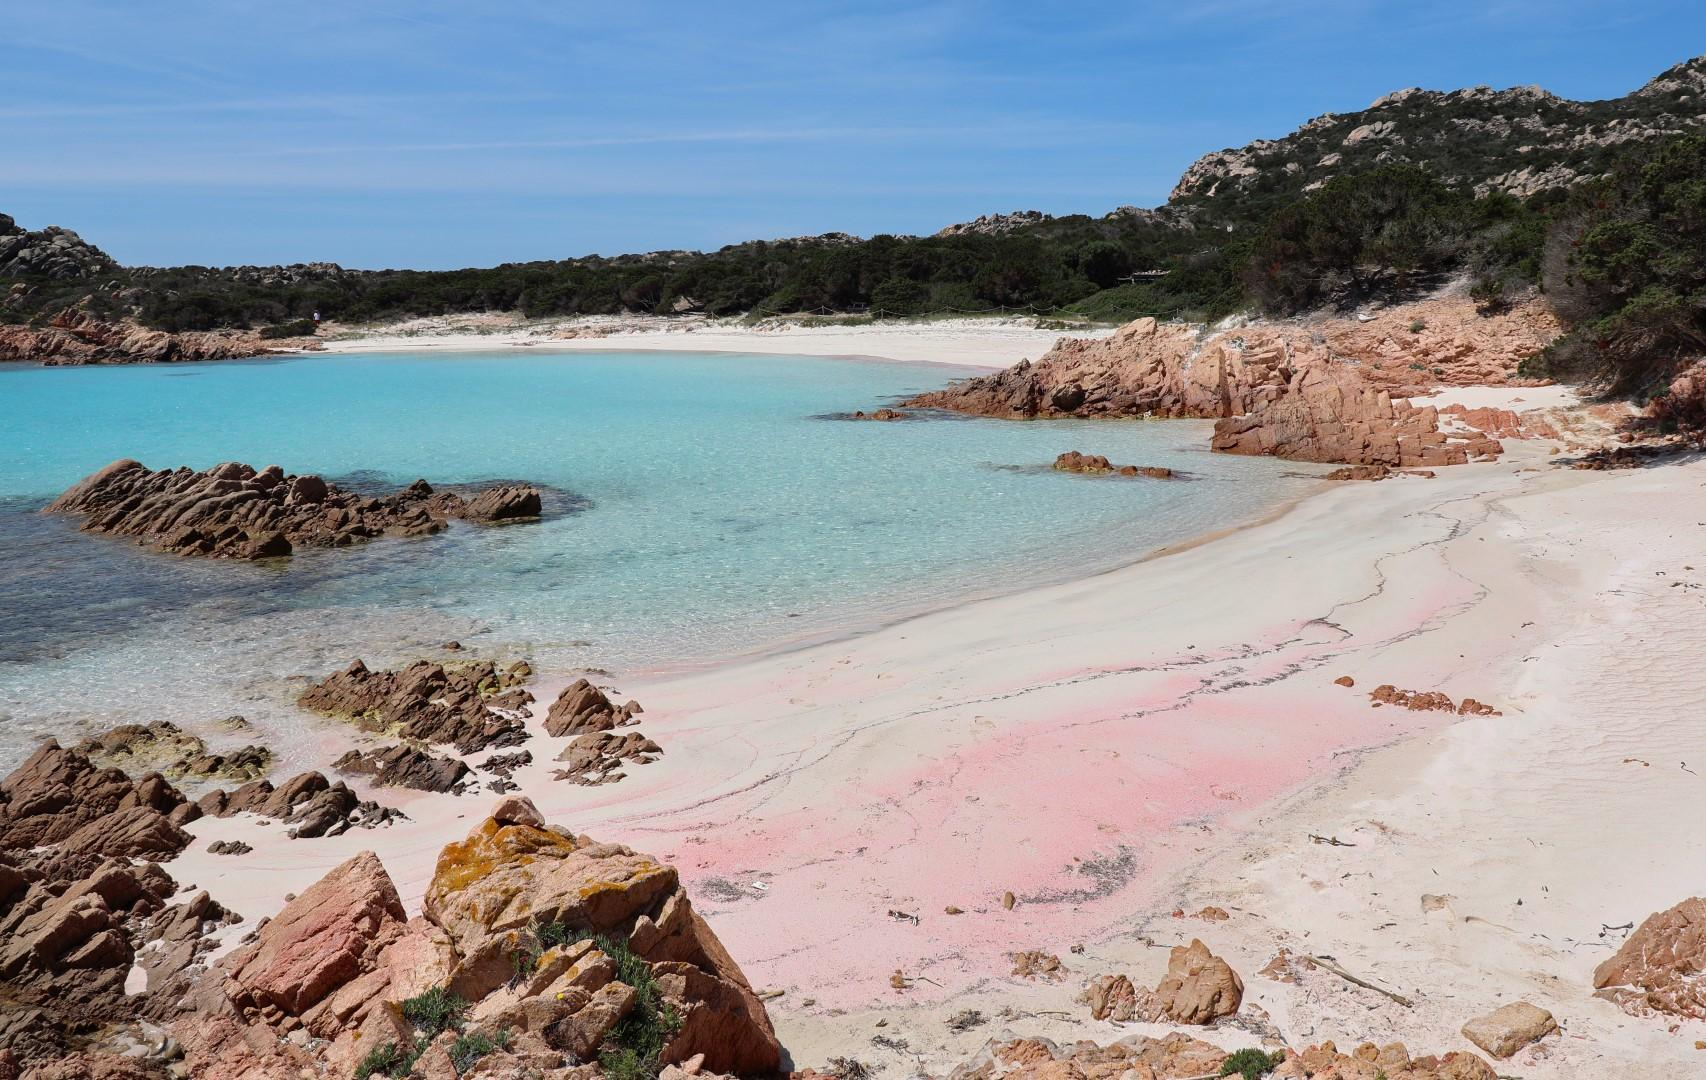 Donnavventura Summer Beach si conclude in Sardegna